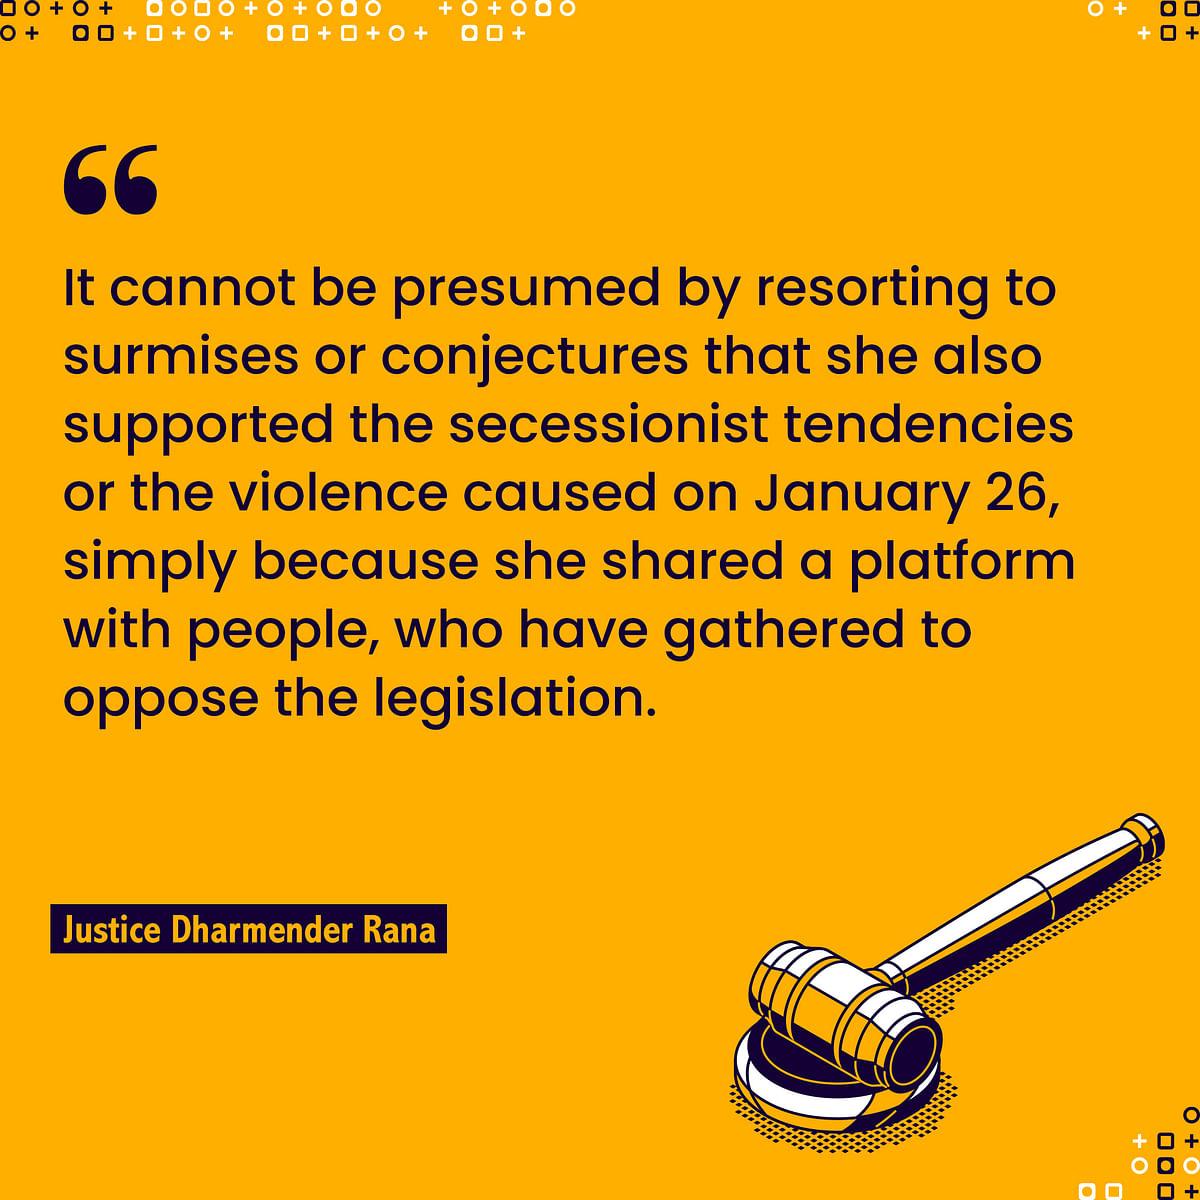 Disha Ravi Bail: Lessons for Govt on Sedition, Freedom, Dissent